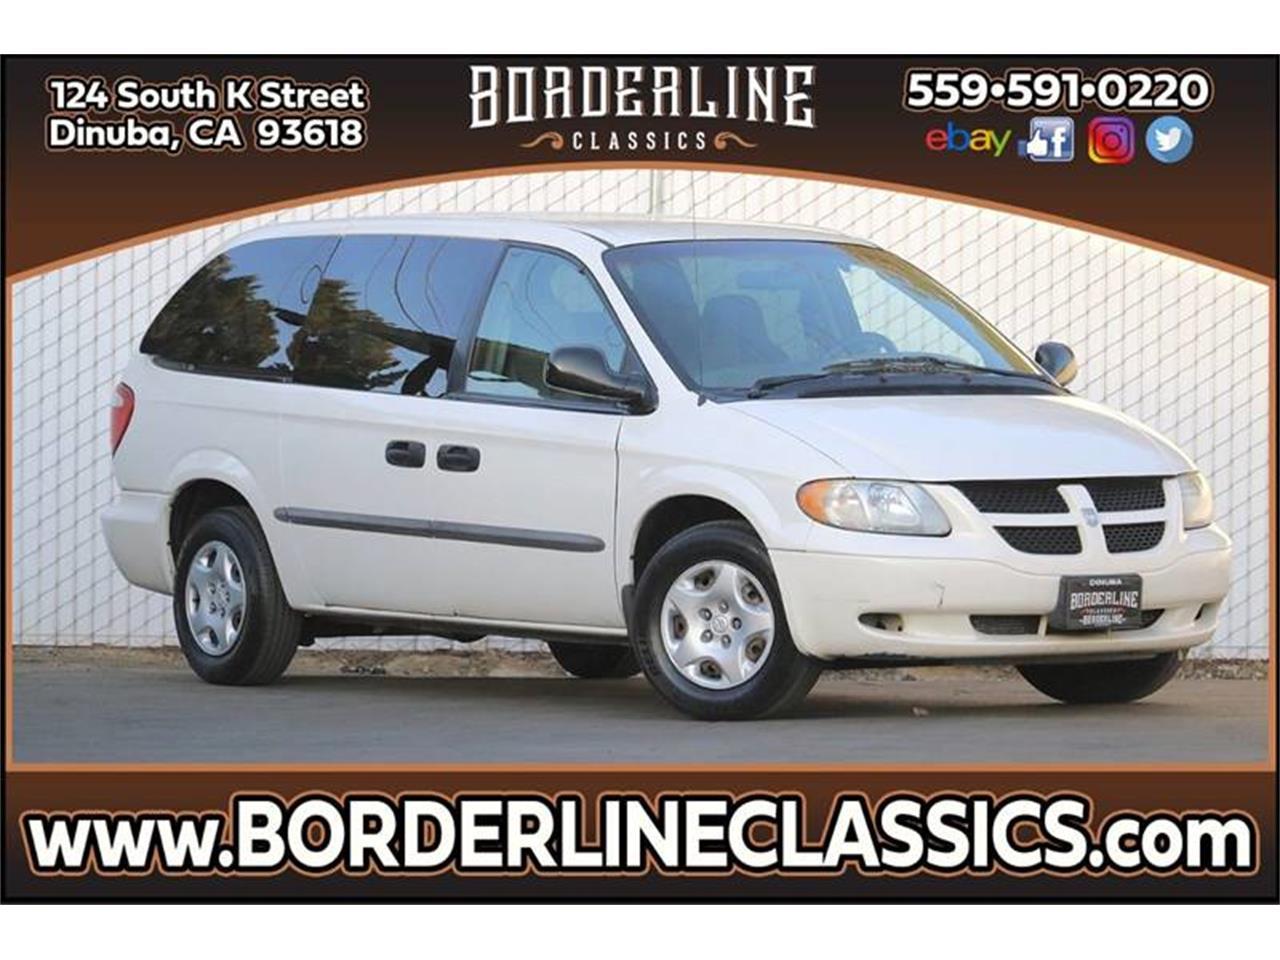 for sale 2002 dodge grand caravan in dinuba, california cars - dinuba, ca at geebo